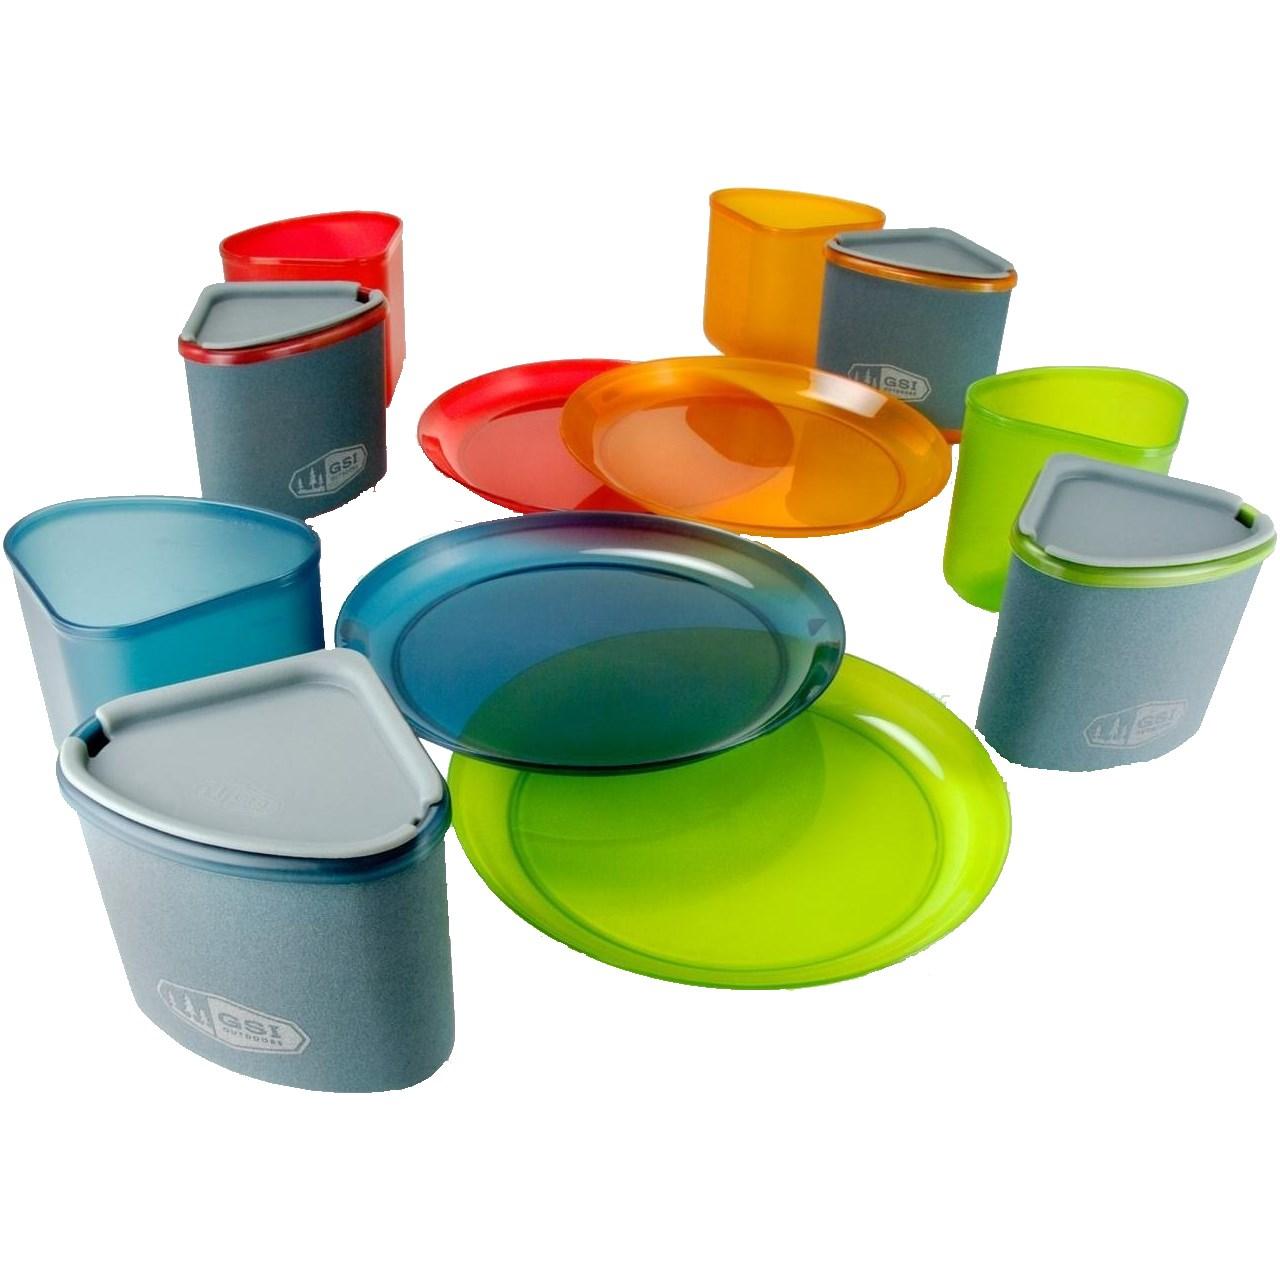 ست ظروف غذا جی اس آی مدل  Infinity Compact table